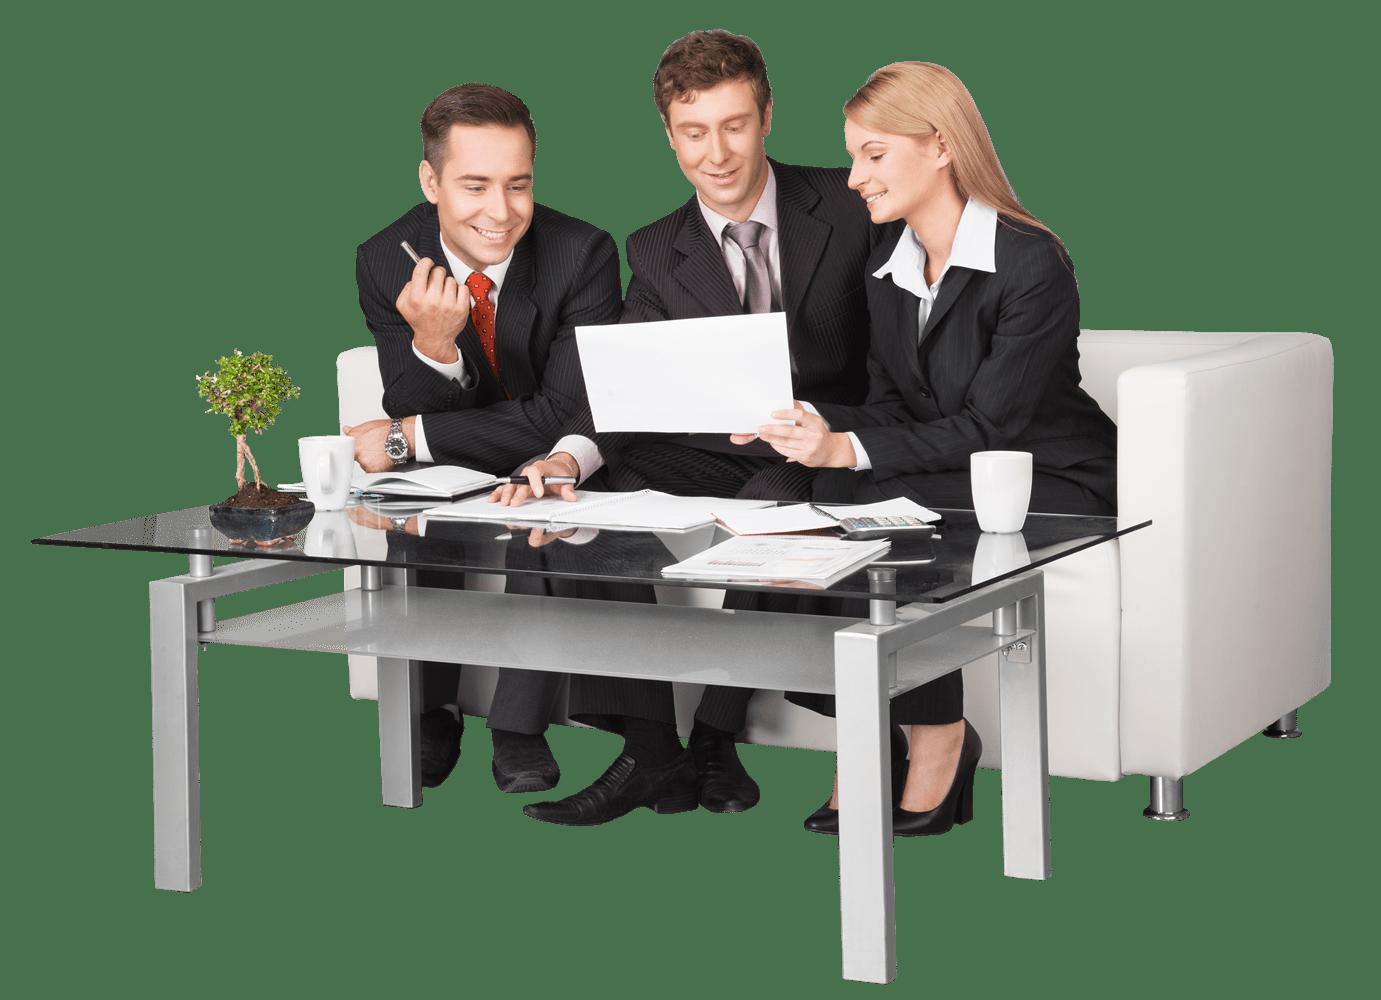 Team Meeting over laptop